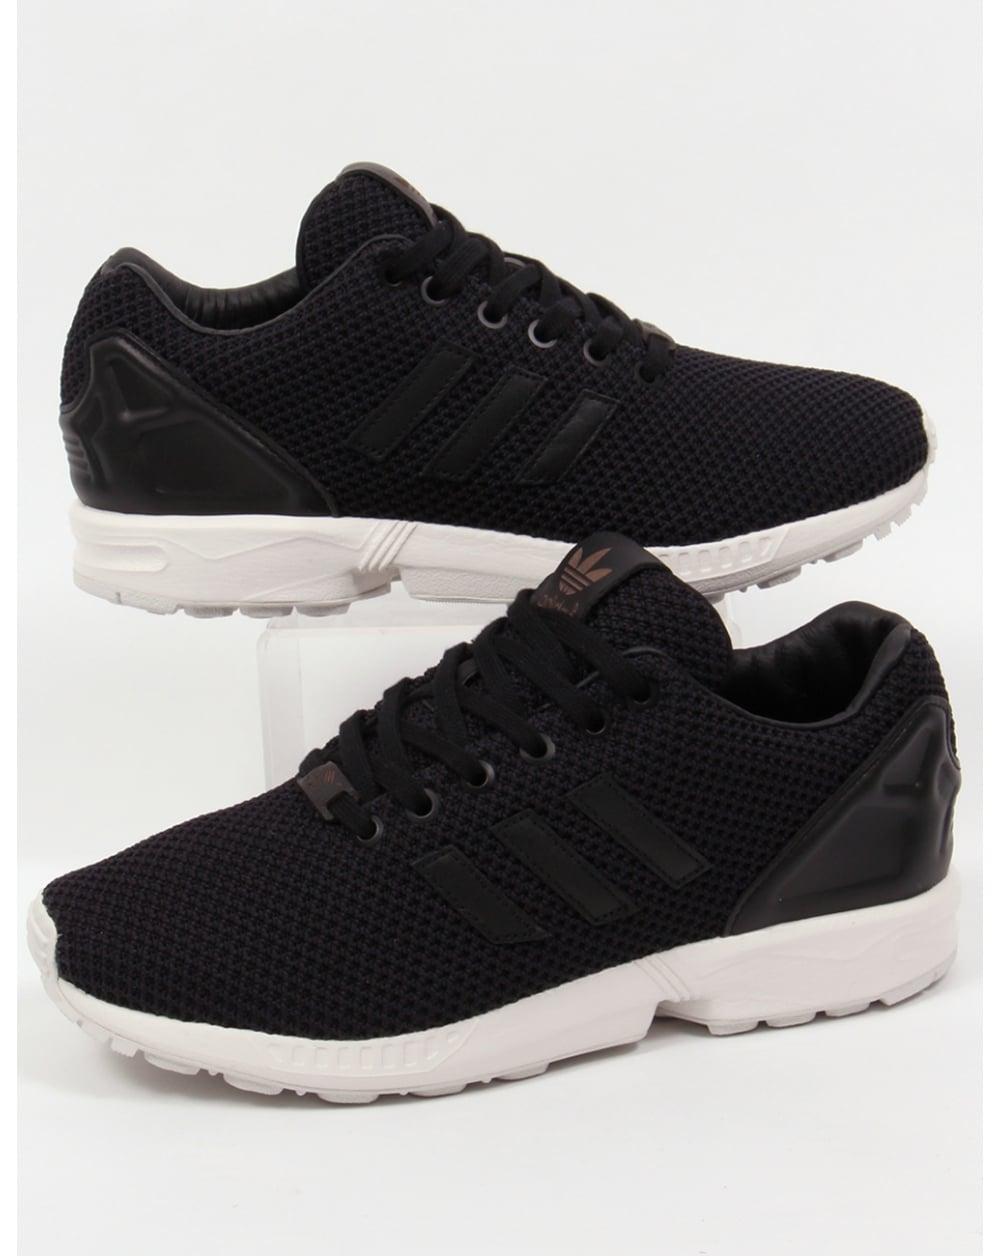 adidas zx flux trainers black black white originals shoes sneakers men. Black Bedroom Furniture Sets. Home Design Ideas